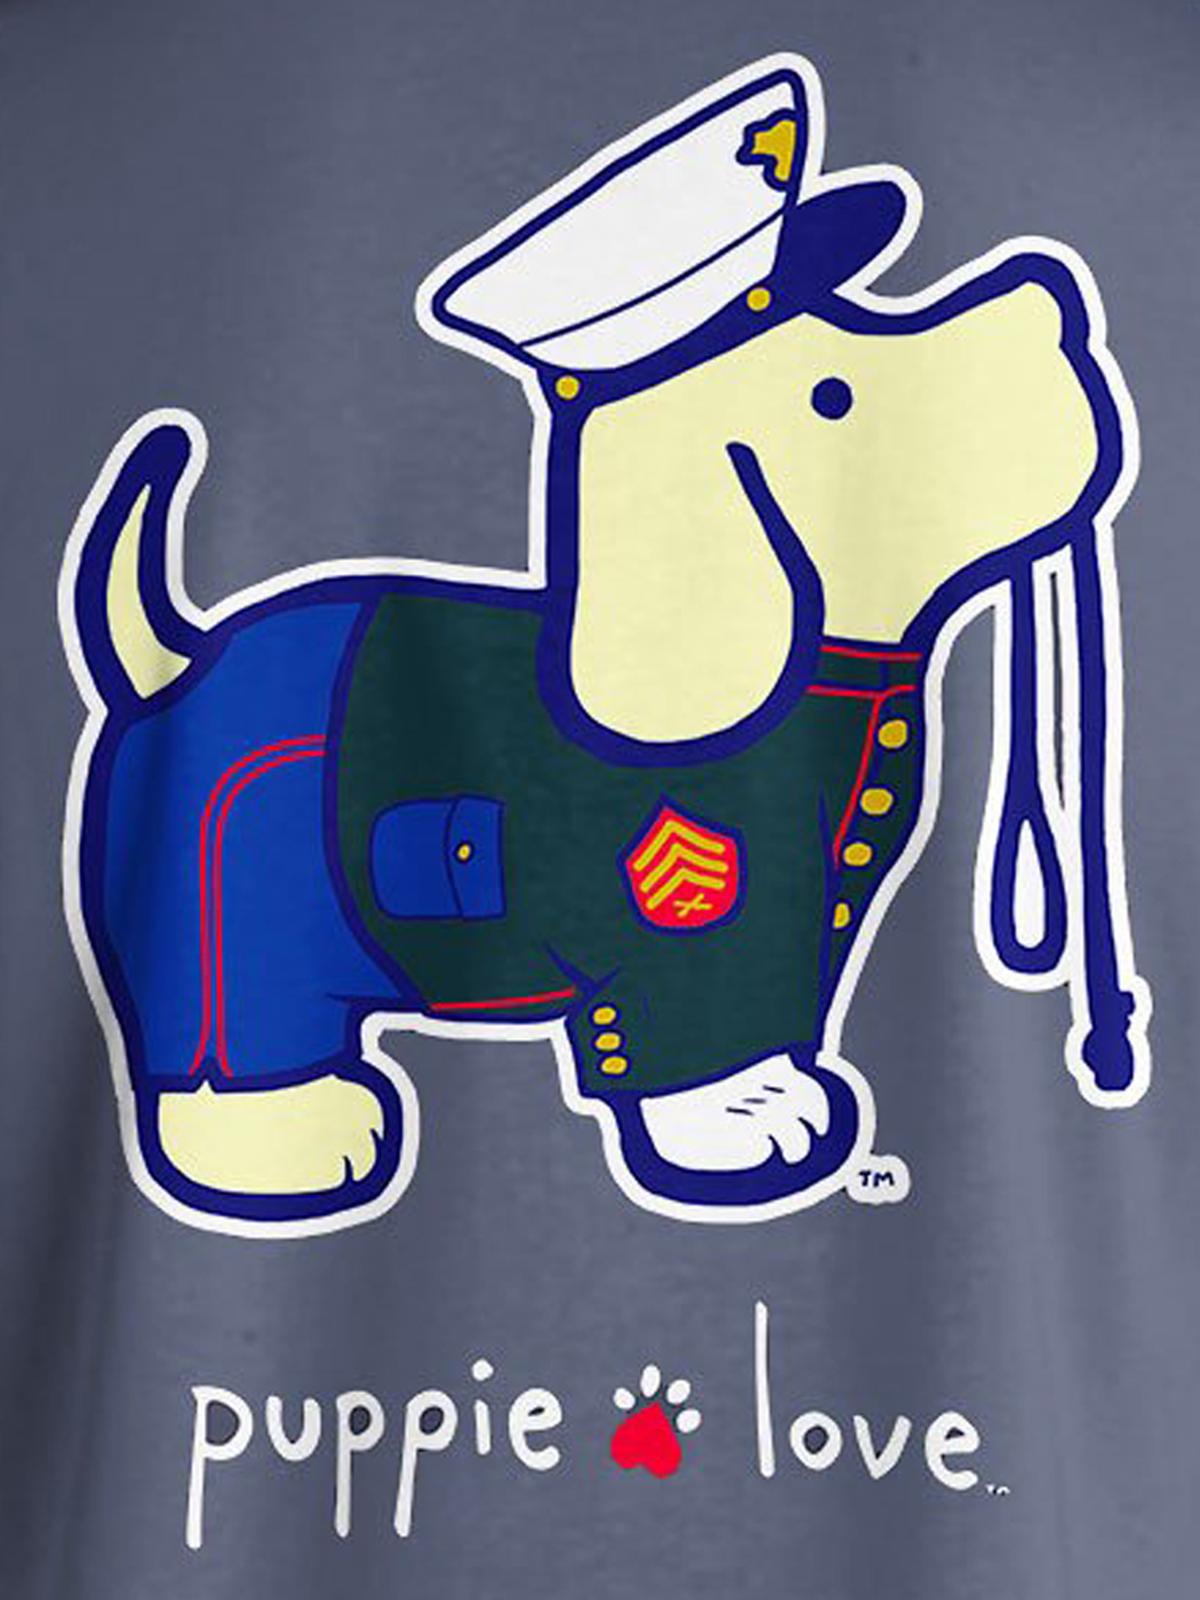 Puppie Love Rescue Dog Adult Unisex Short Sleeve Graphic T-Shirt, Marine Pup